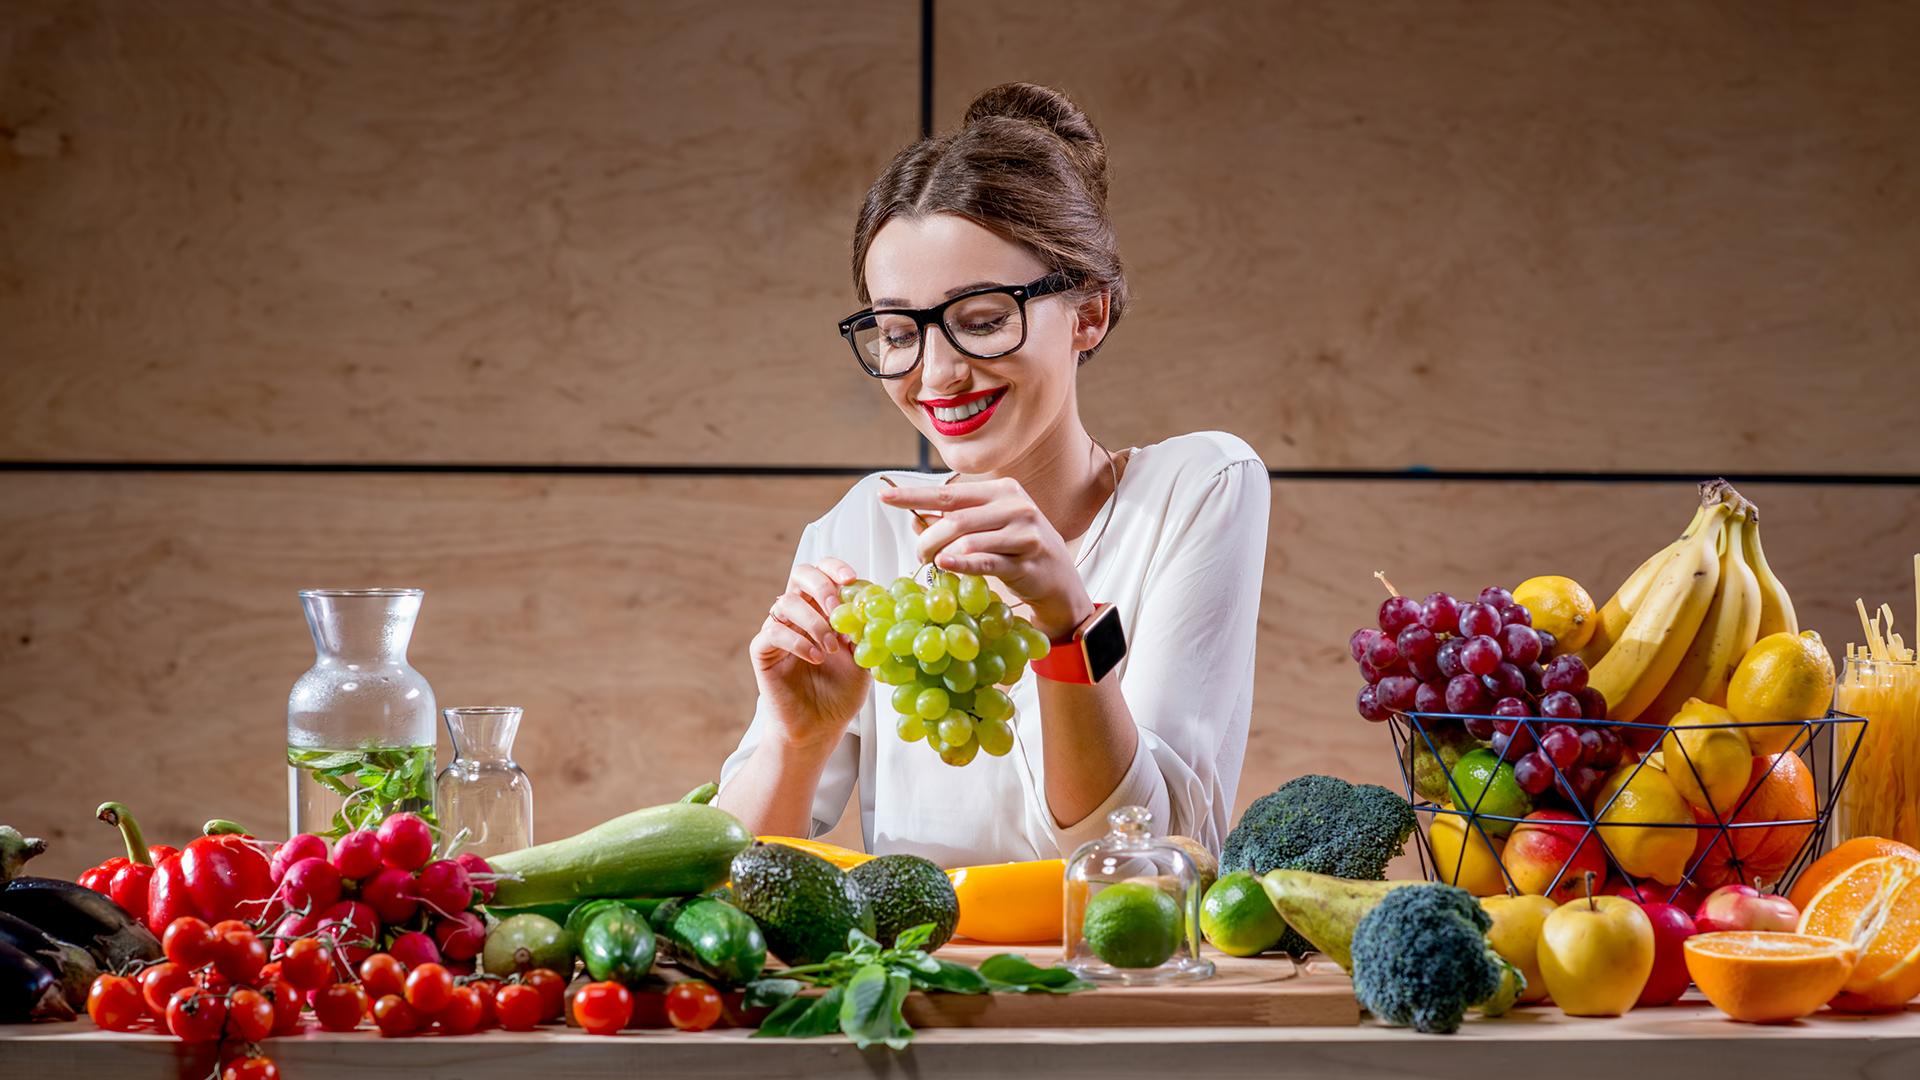 Dieta vegetariana mala para la salud